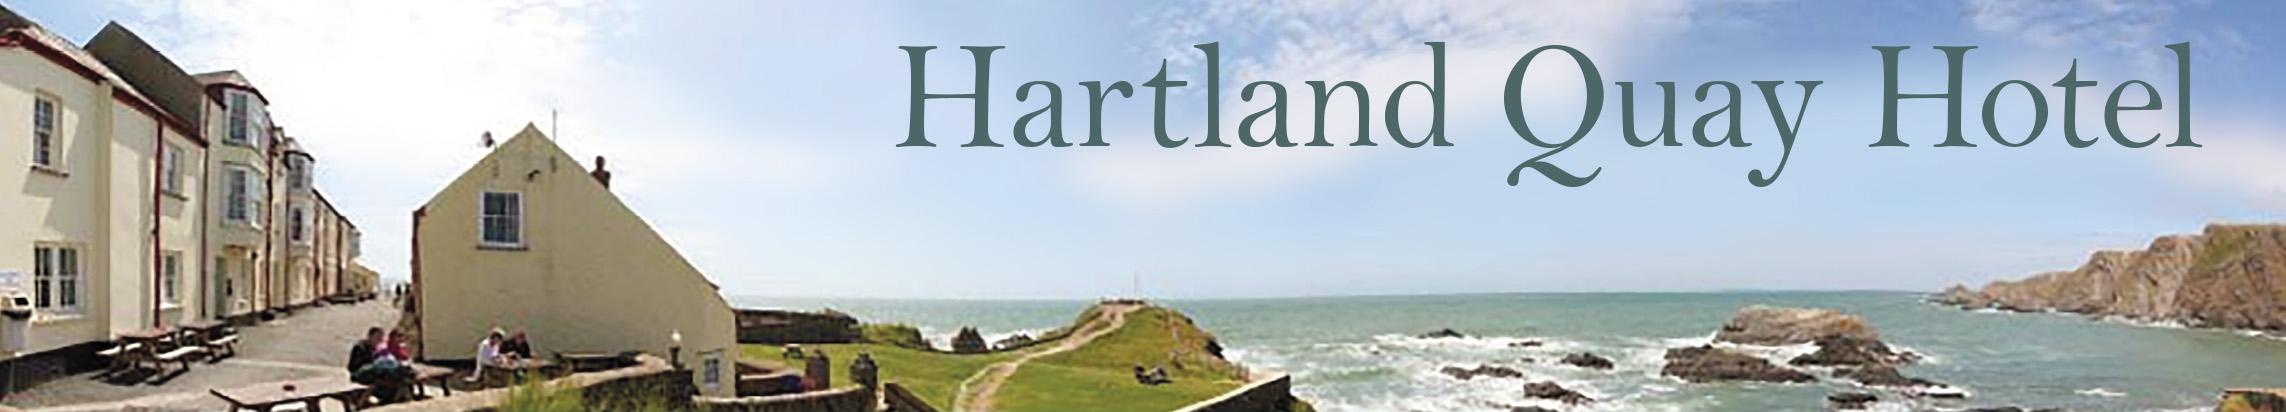 Hartland Quay Hotel